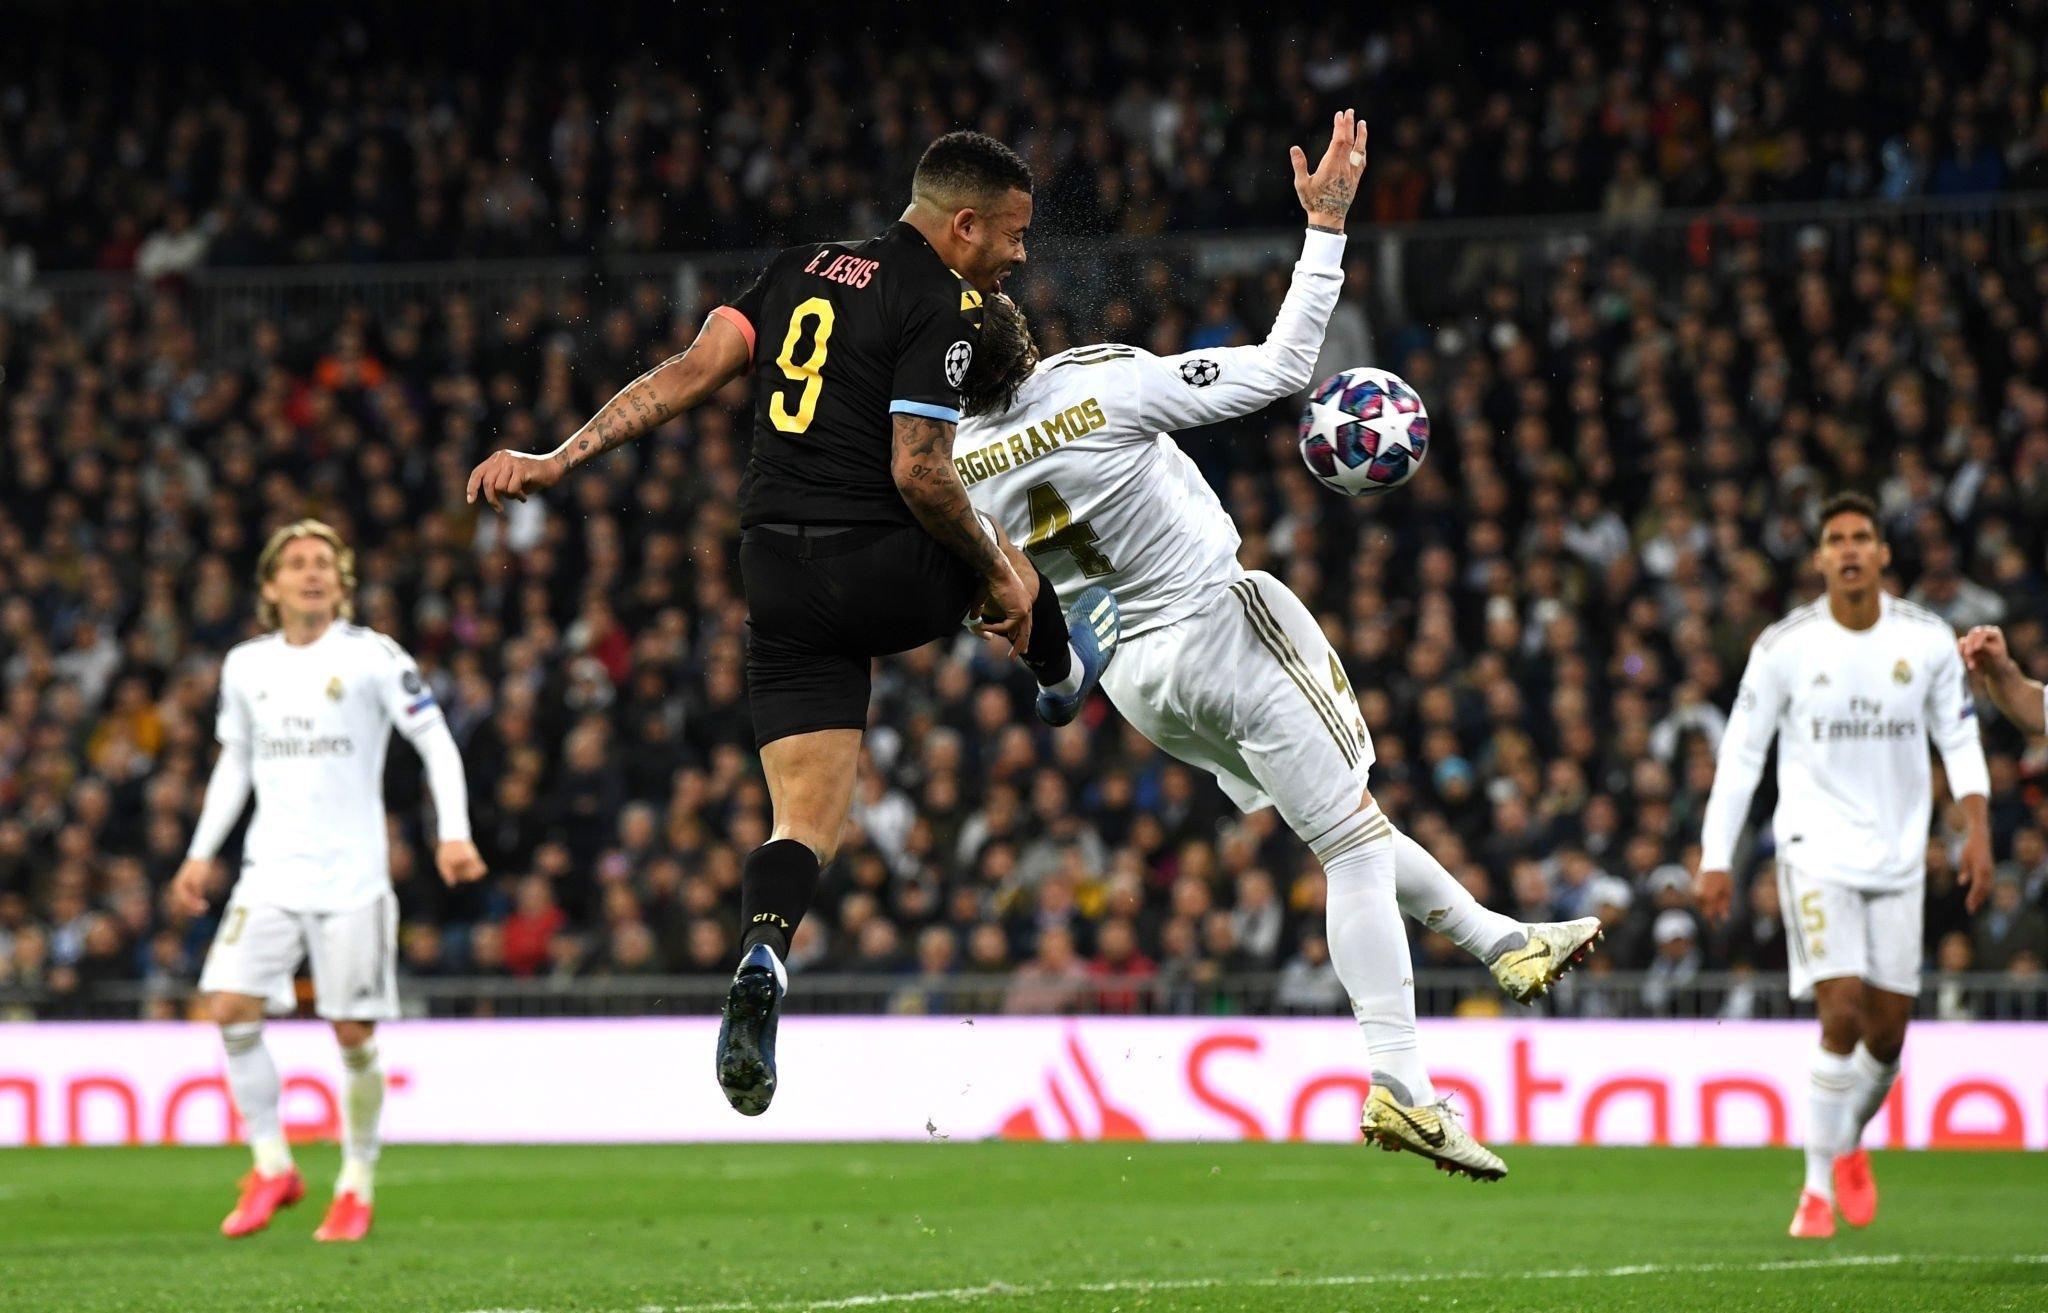 Реал Мадрид - Манчестер Сити, гол Жезусв